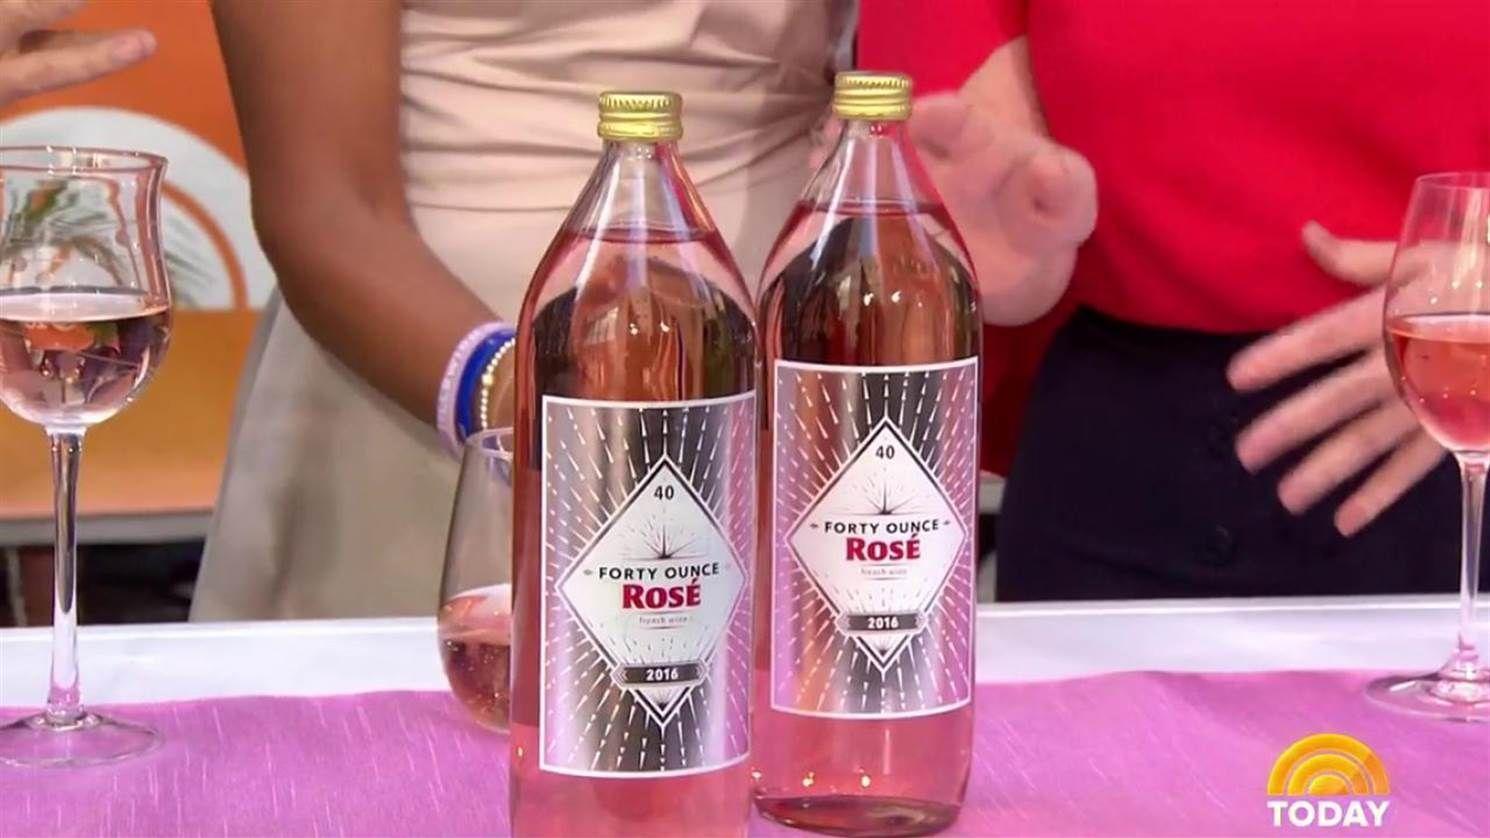 Must Try Summer Wines Rose Bottled Sangria Sparklers And More Summer Wines Wedding Wine Bottles Wines